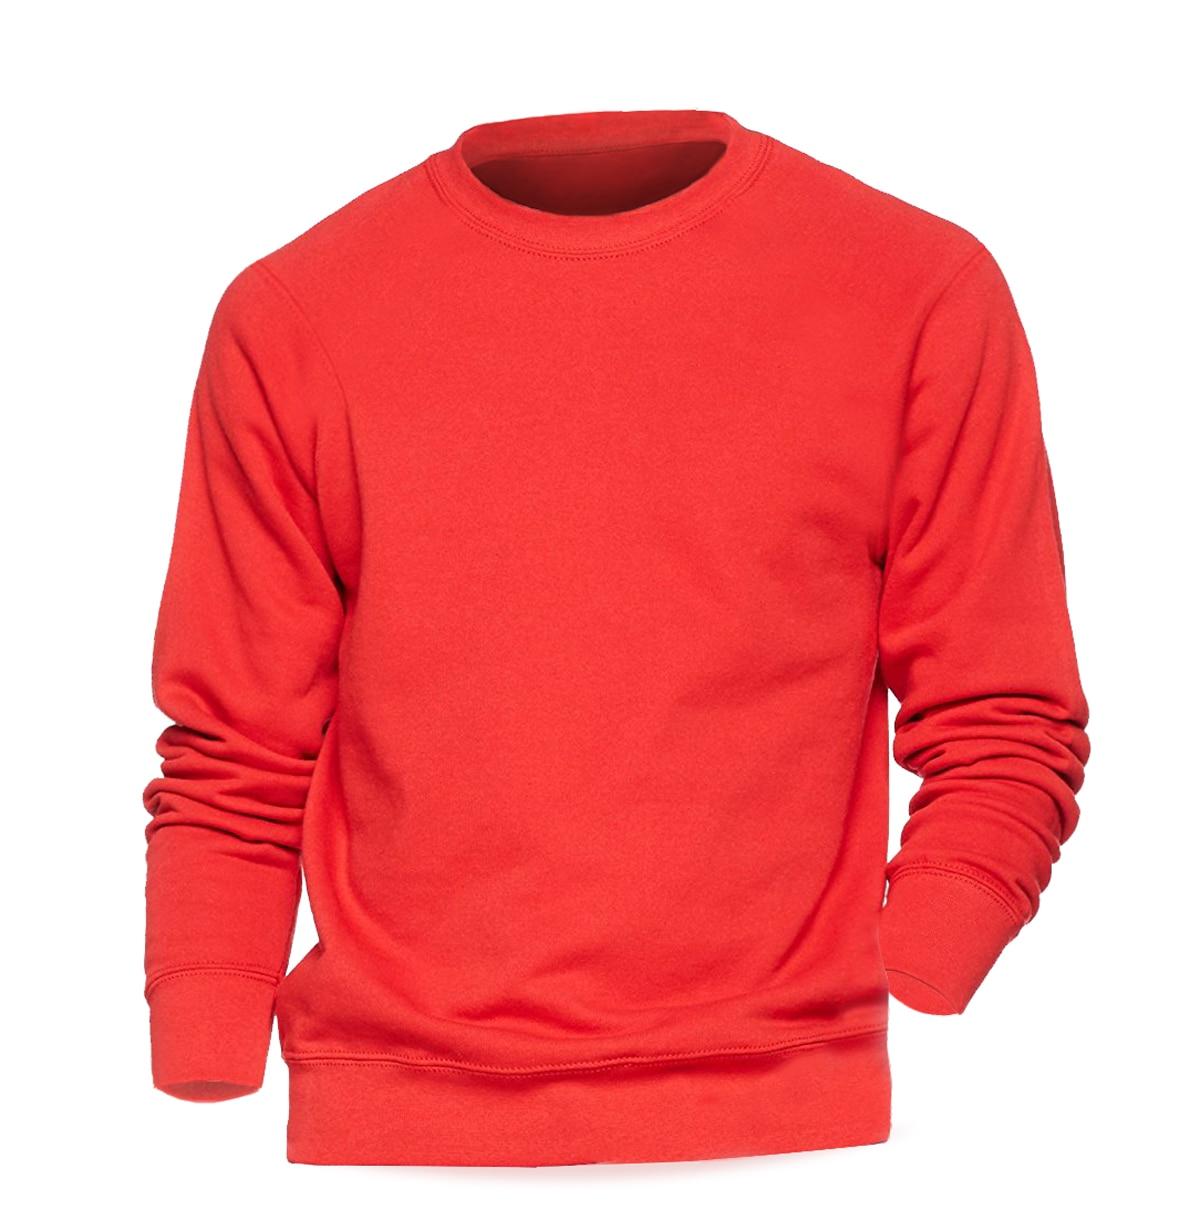 Solid color Sweatshirt Men Hoodie Crewneck Sweatshirts Winter Autumn Fleece Hoody Casual Gray Blue Red Black White Streetwear 27